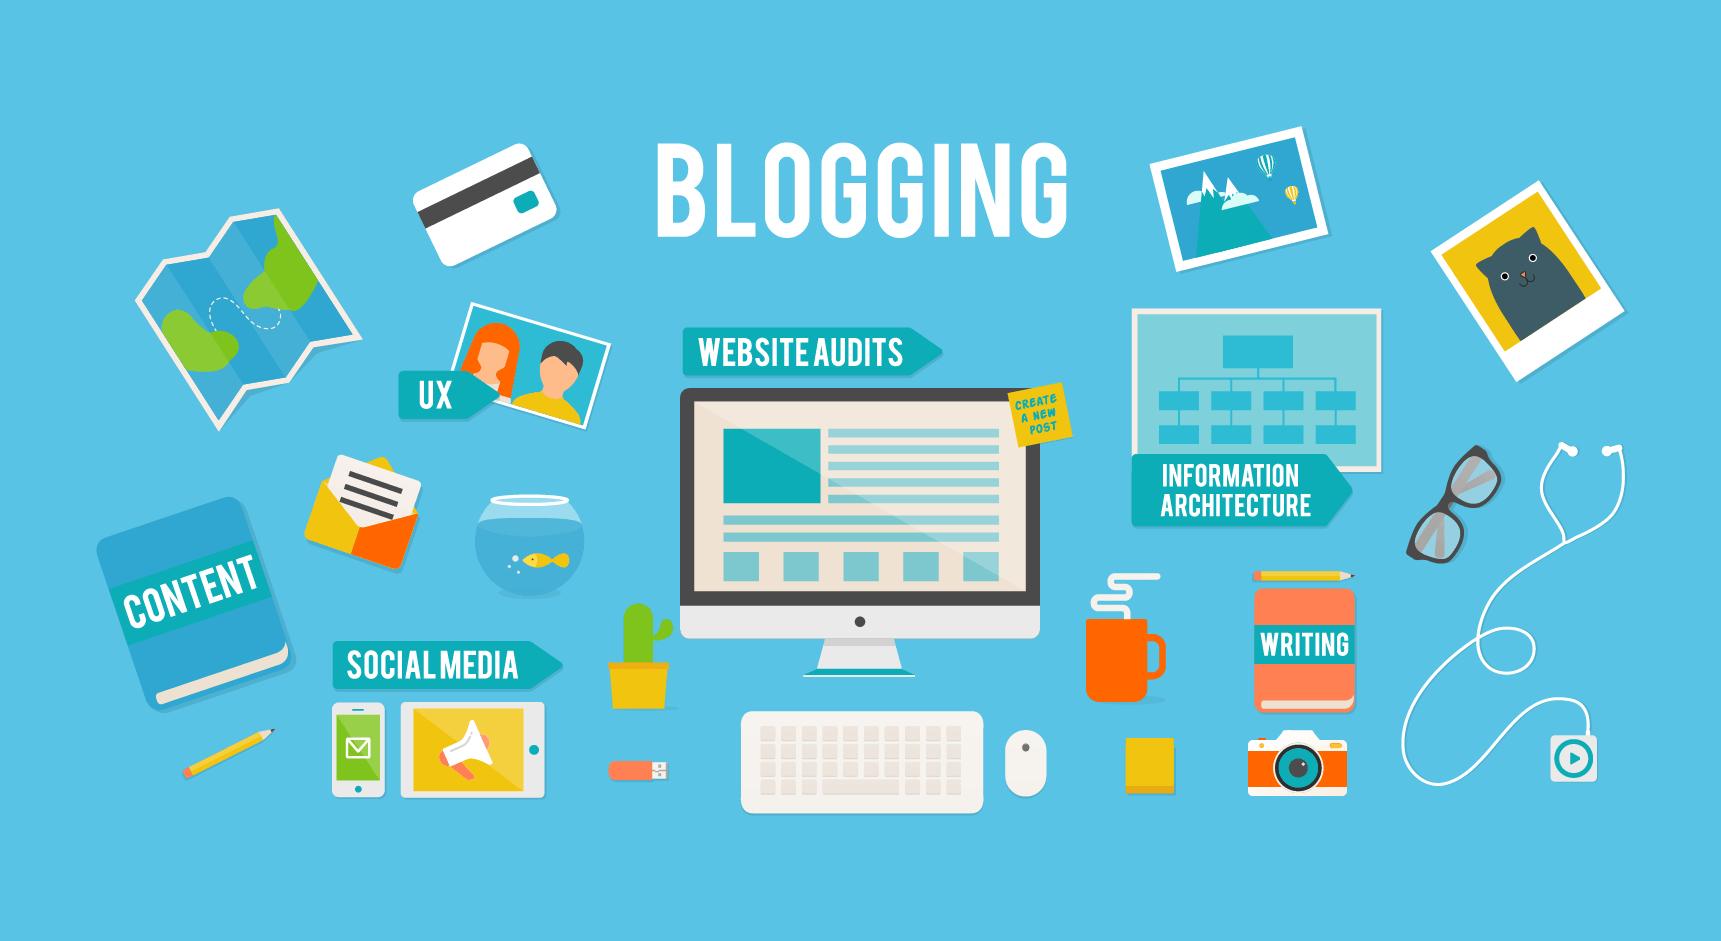 Serunya Blogging Di Jawaban Online Image